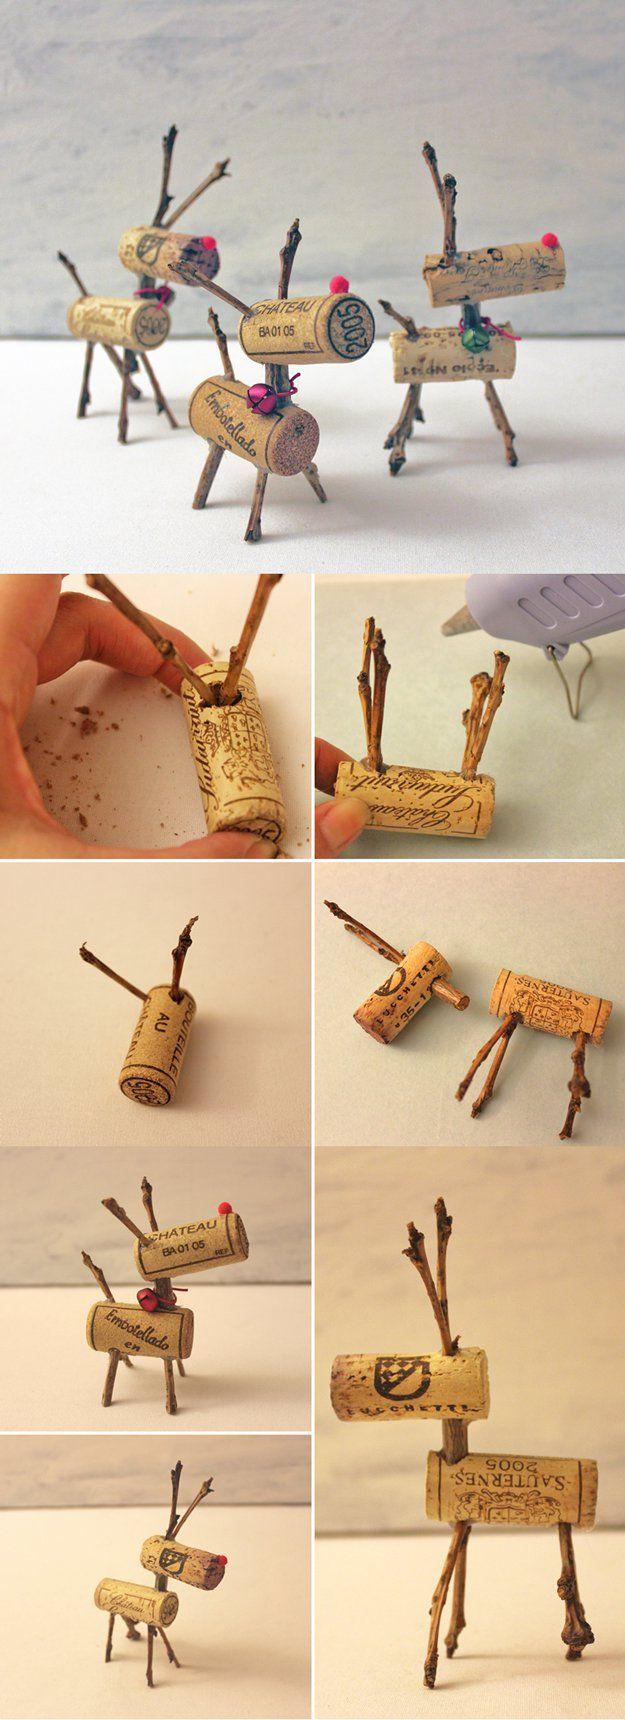 43 More DIY Wine Cork Crafts Ideas DIYReady